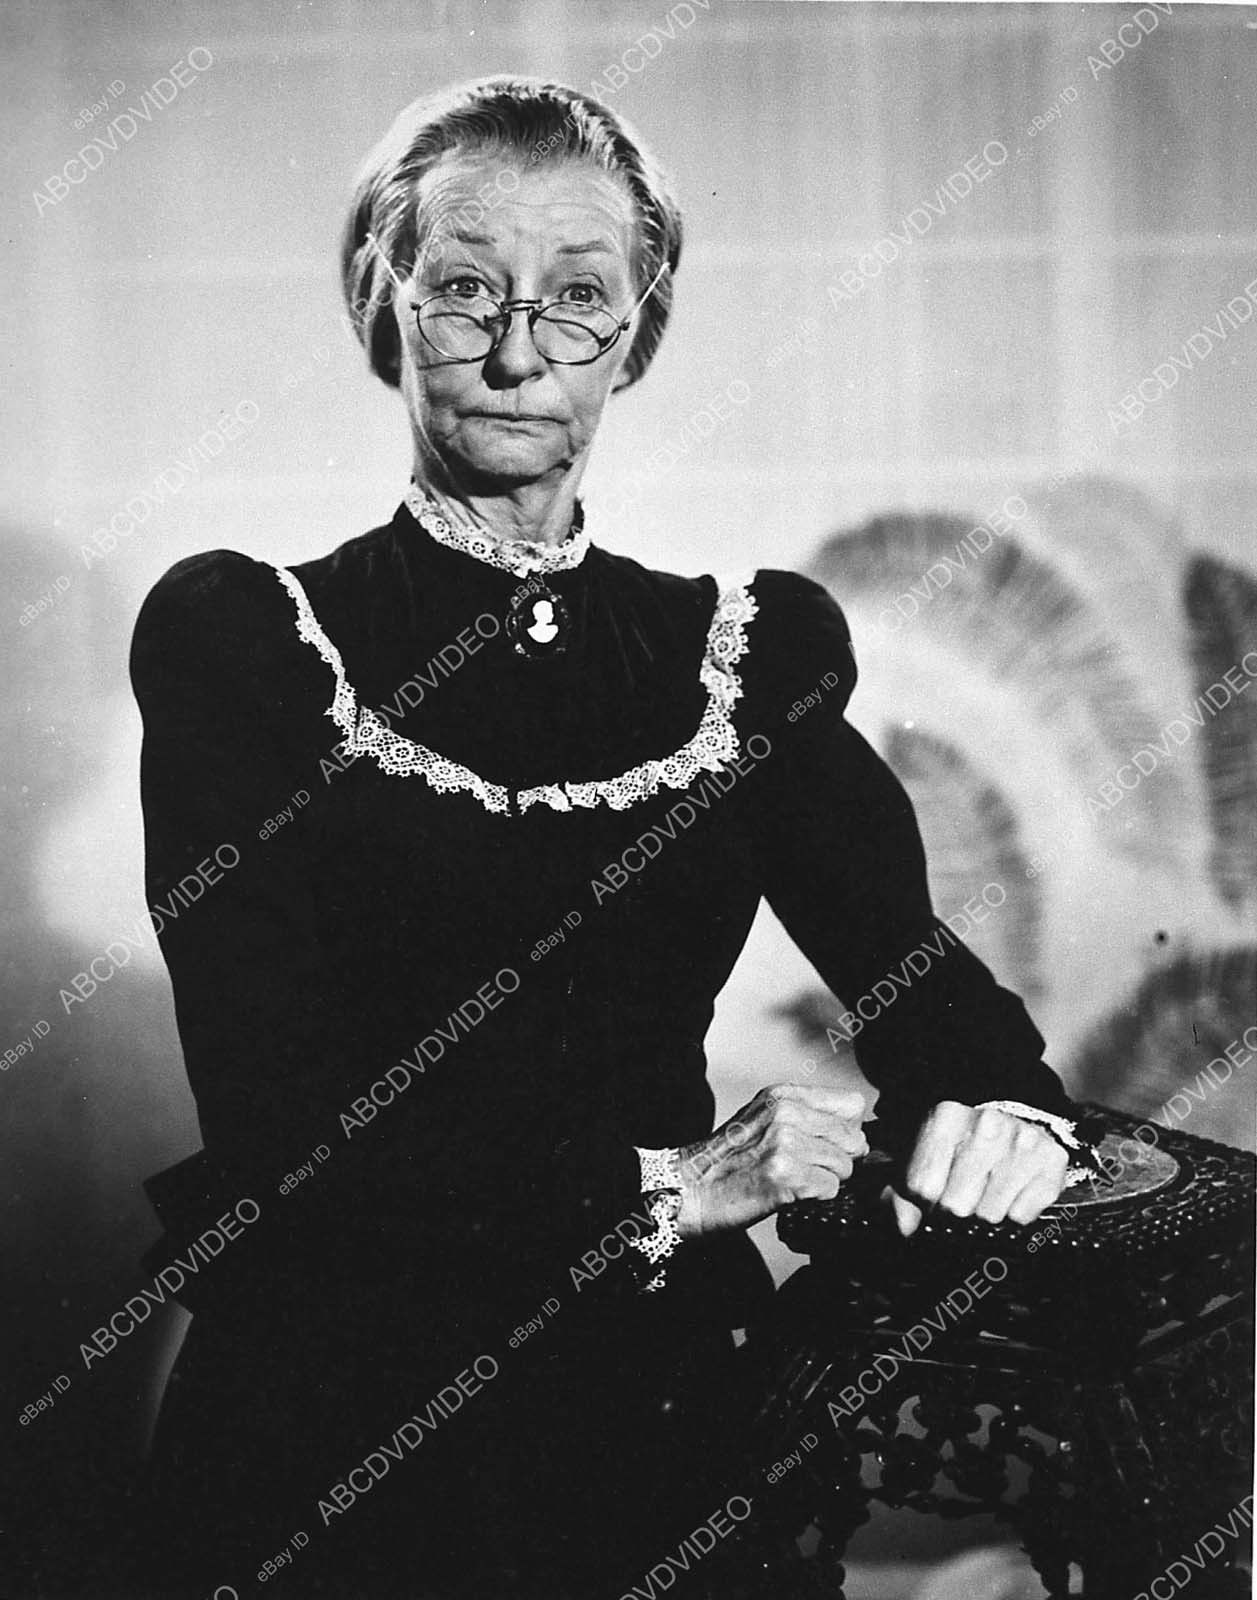 Joan Sims (1930?001),Frances Fuller Sex picture Heather Lauren Olson,Amelia Chellini (1880?944)